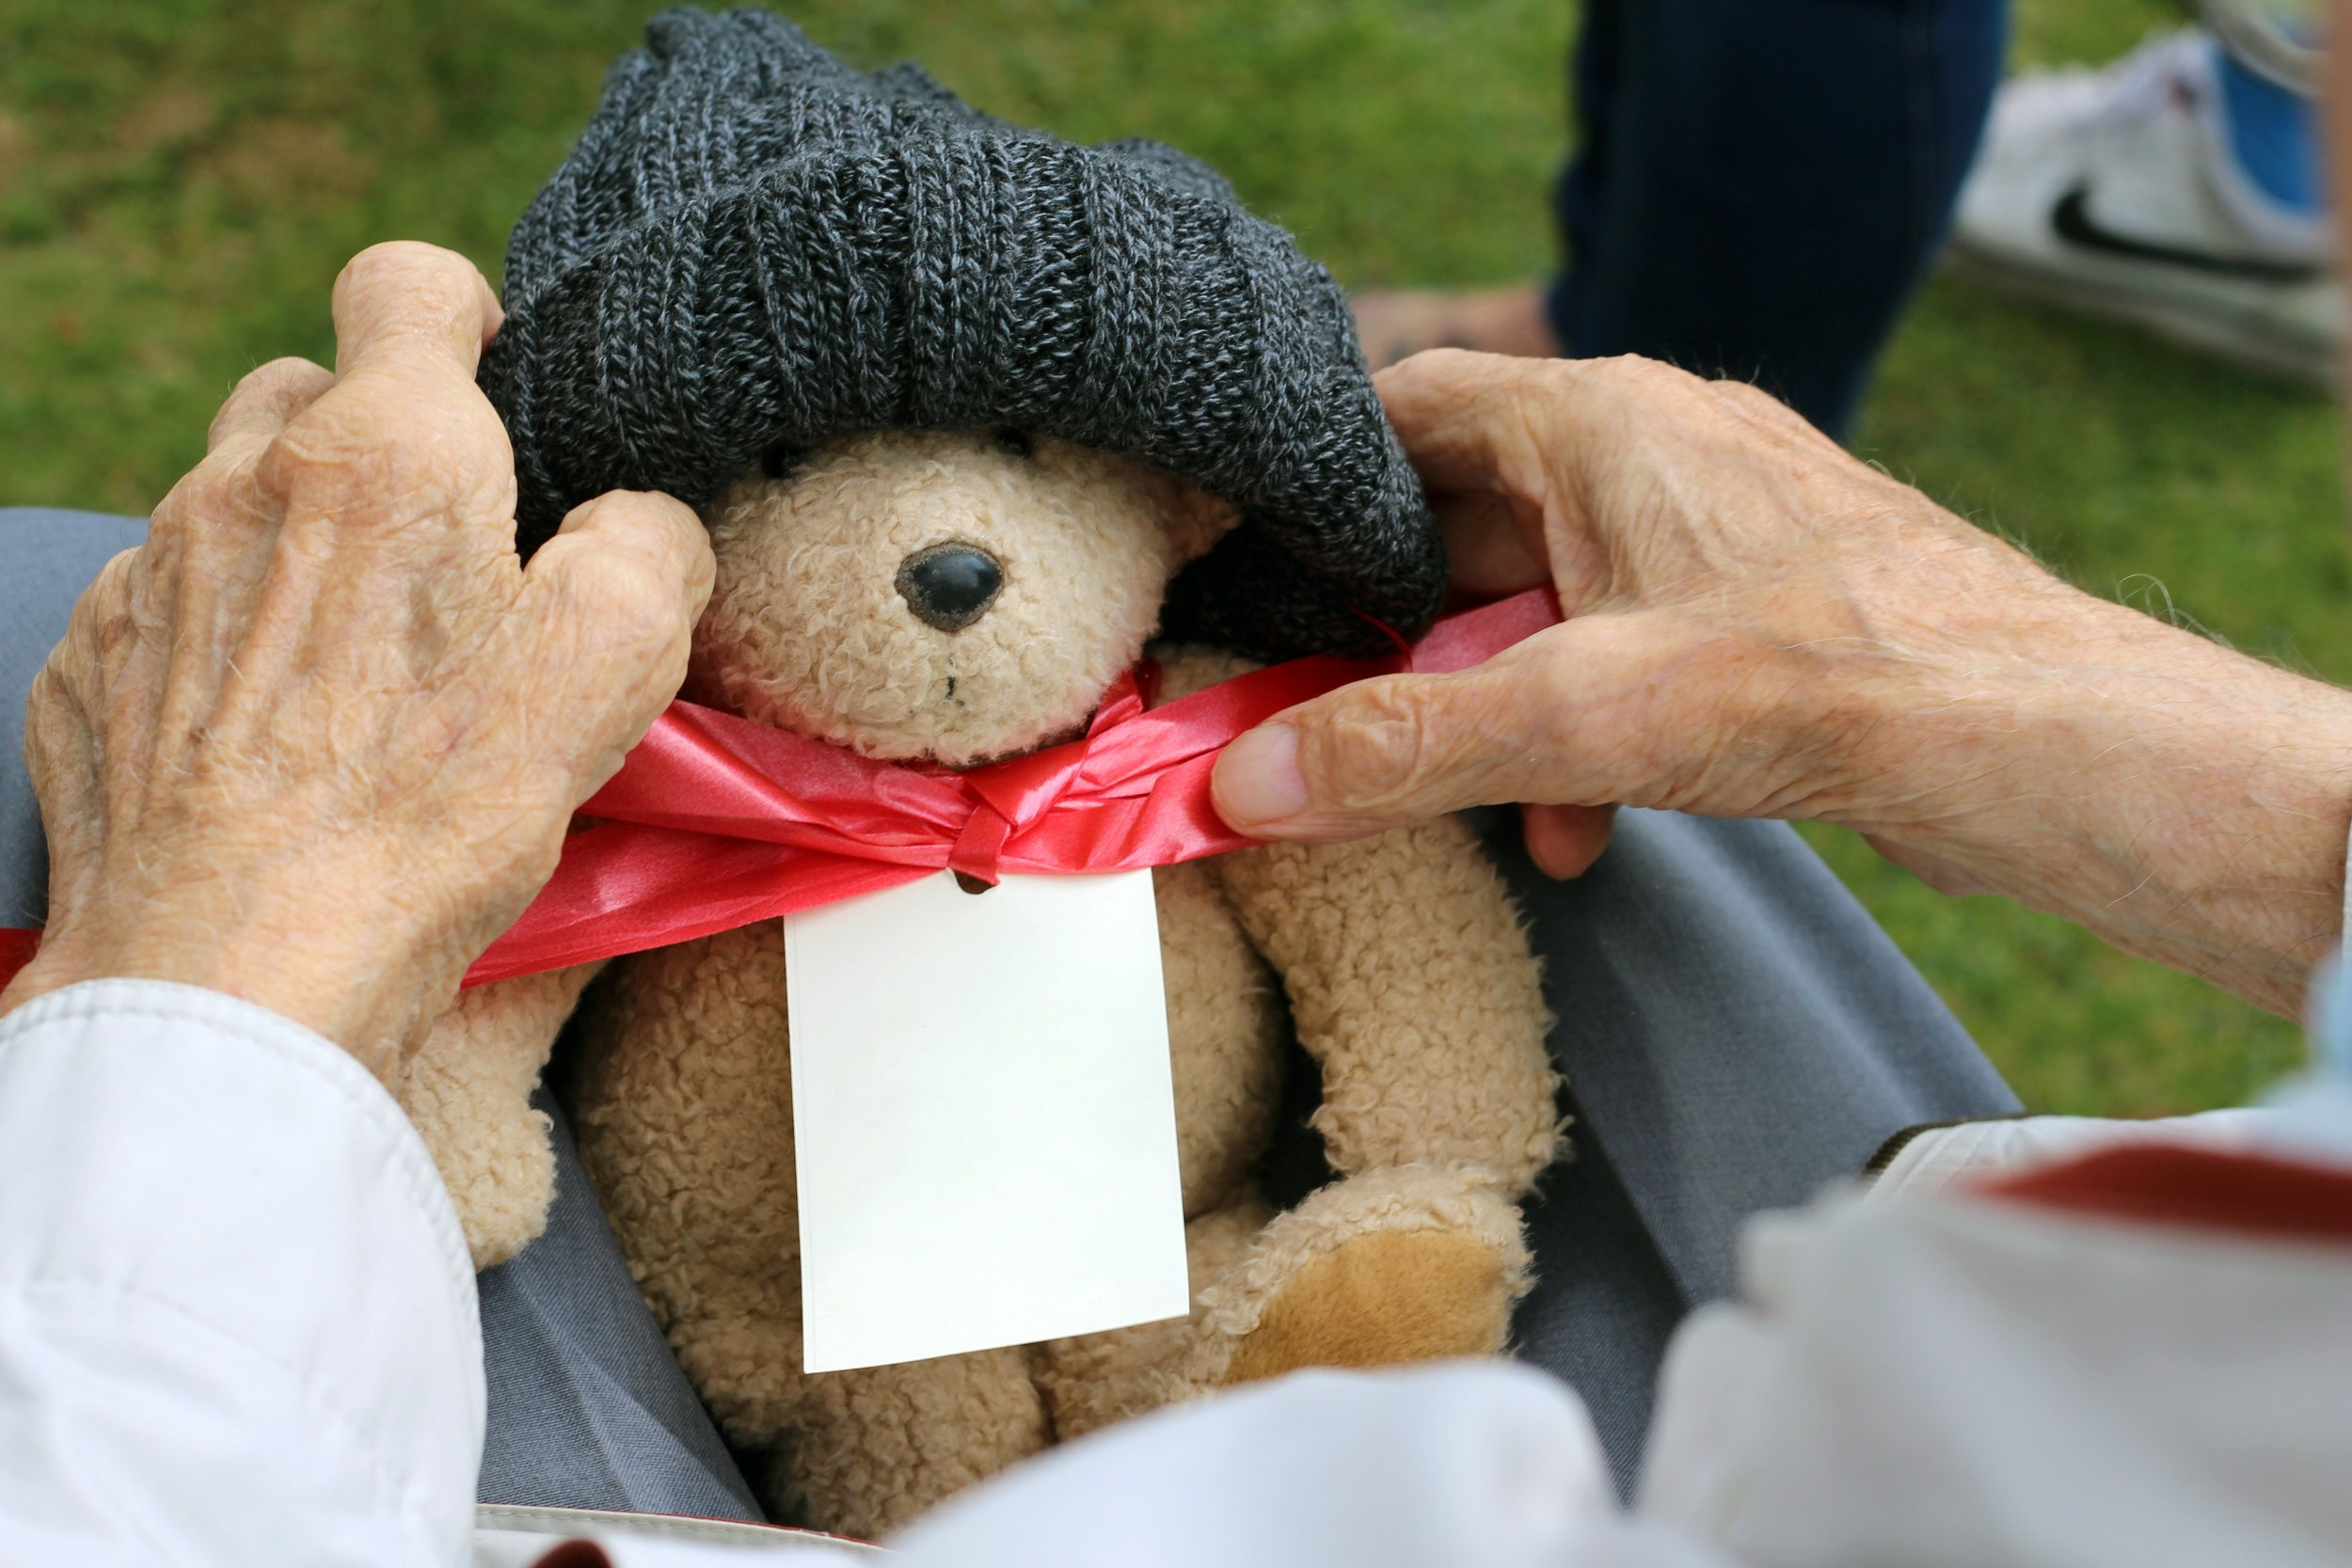 man-old-gift-toy-teddy-bear-caucasian-819887-pxhere.com.jpg